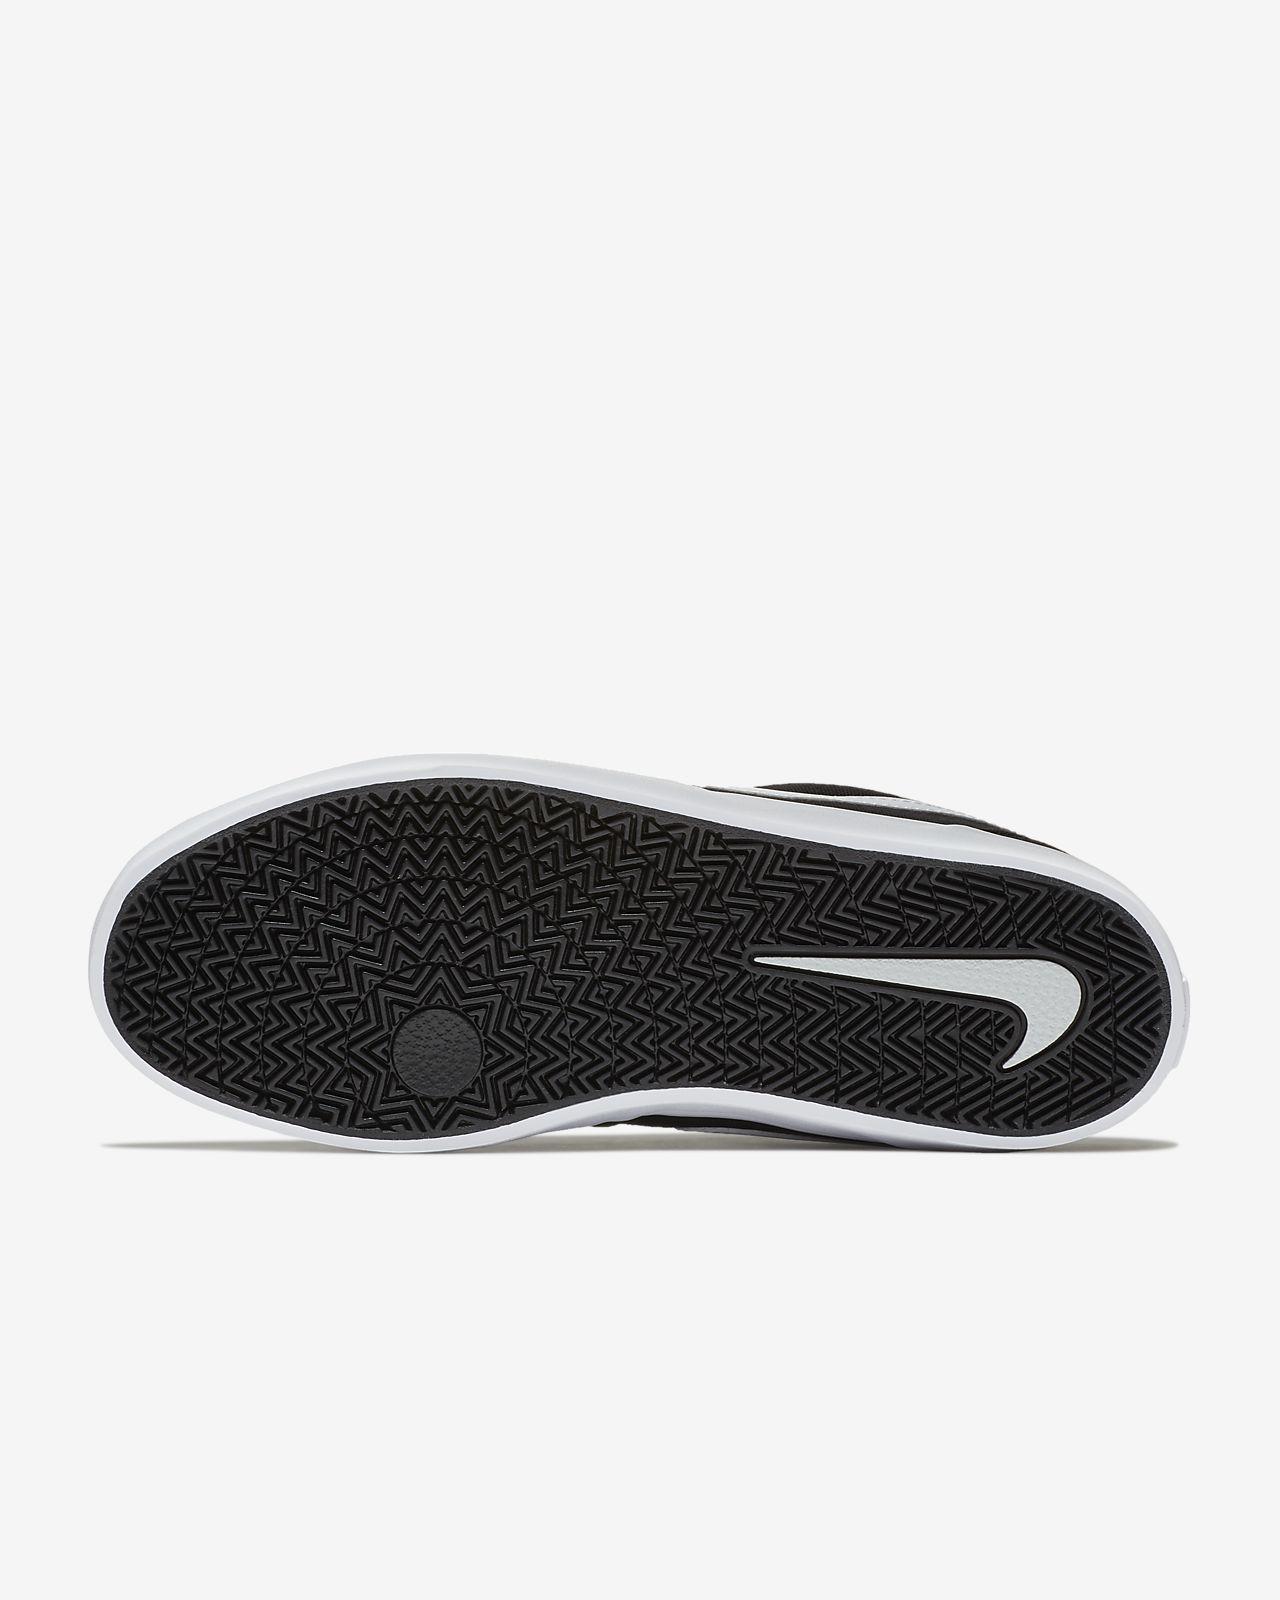 165899e796bfb Nike SB Check Solarsoft Canvas Women s Skateboarding Shoe. Nike.com